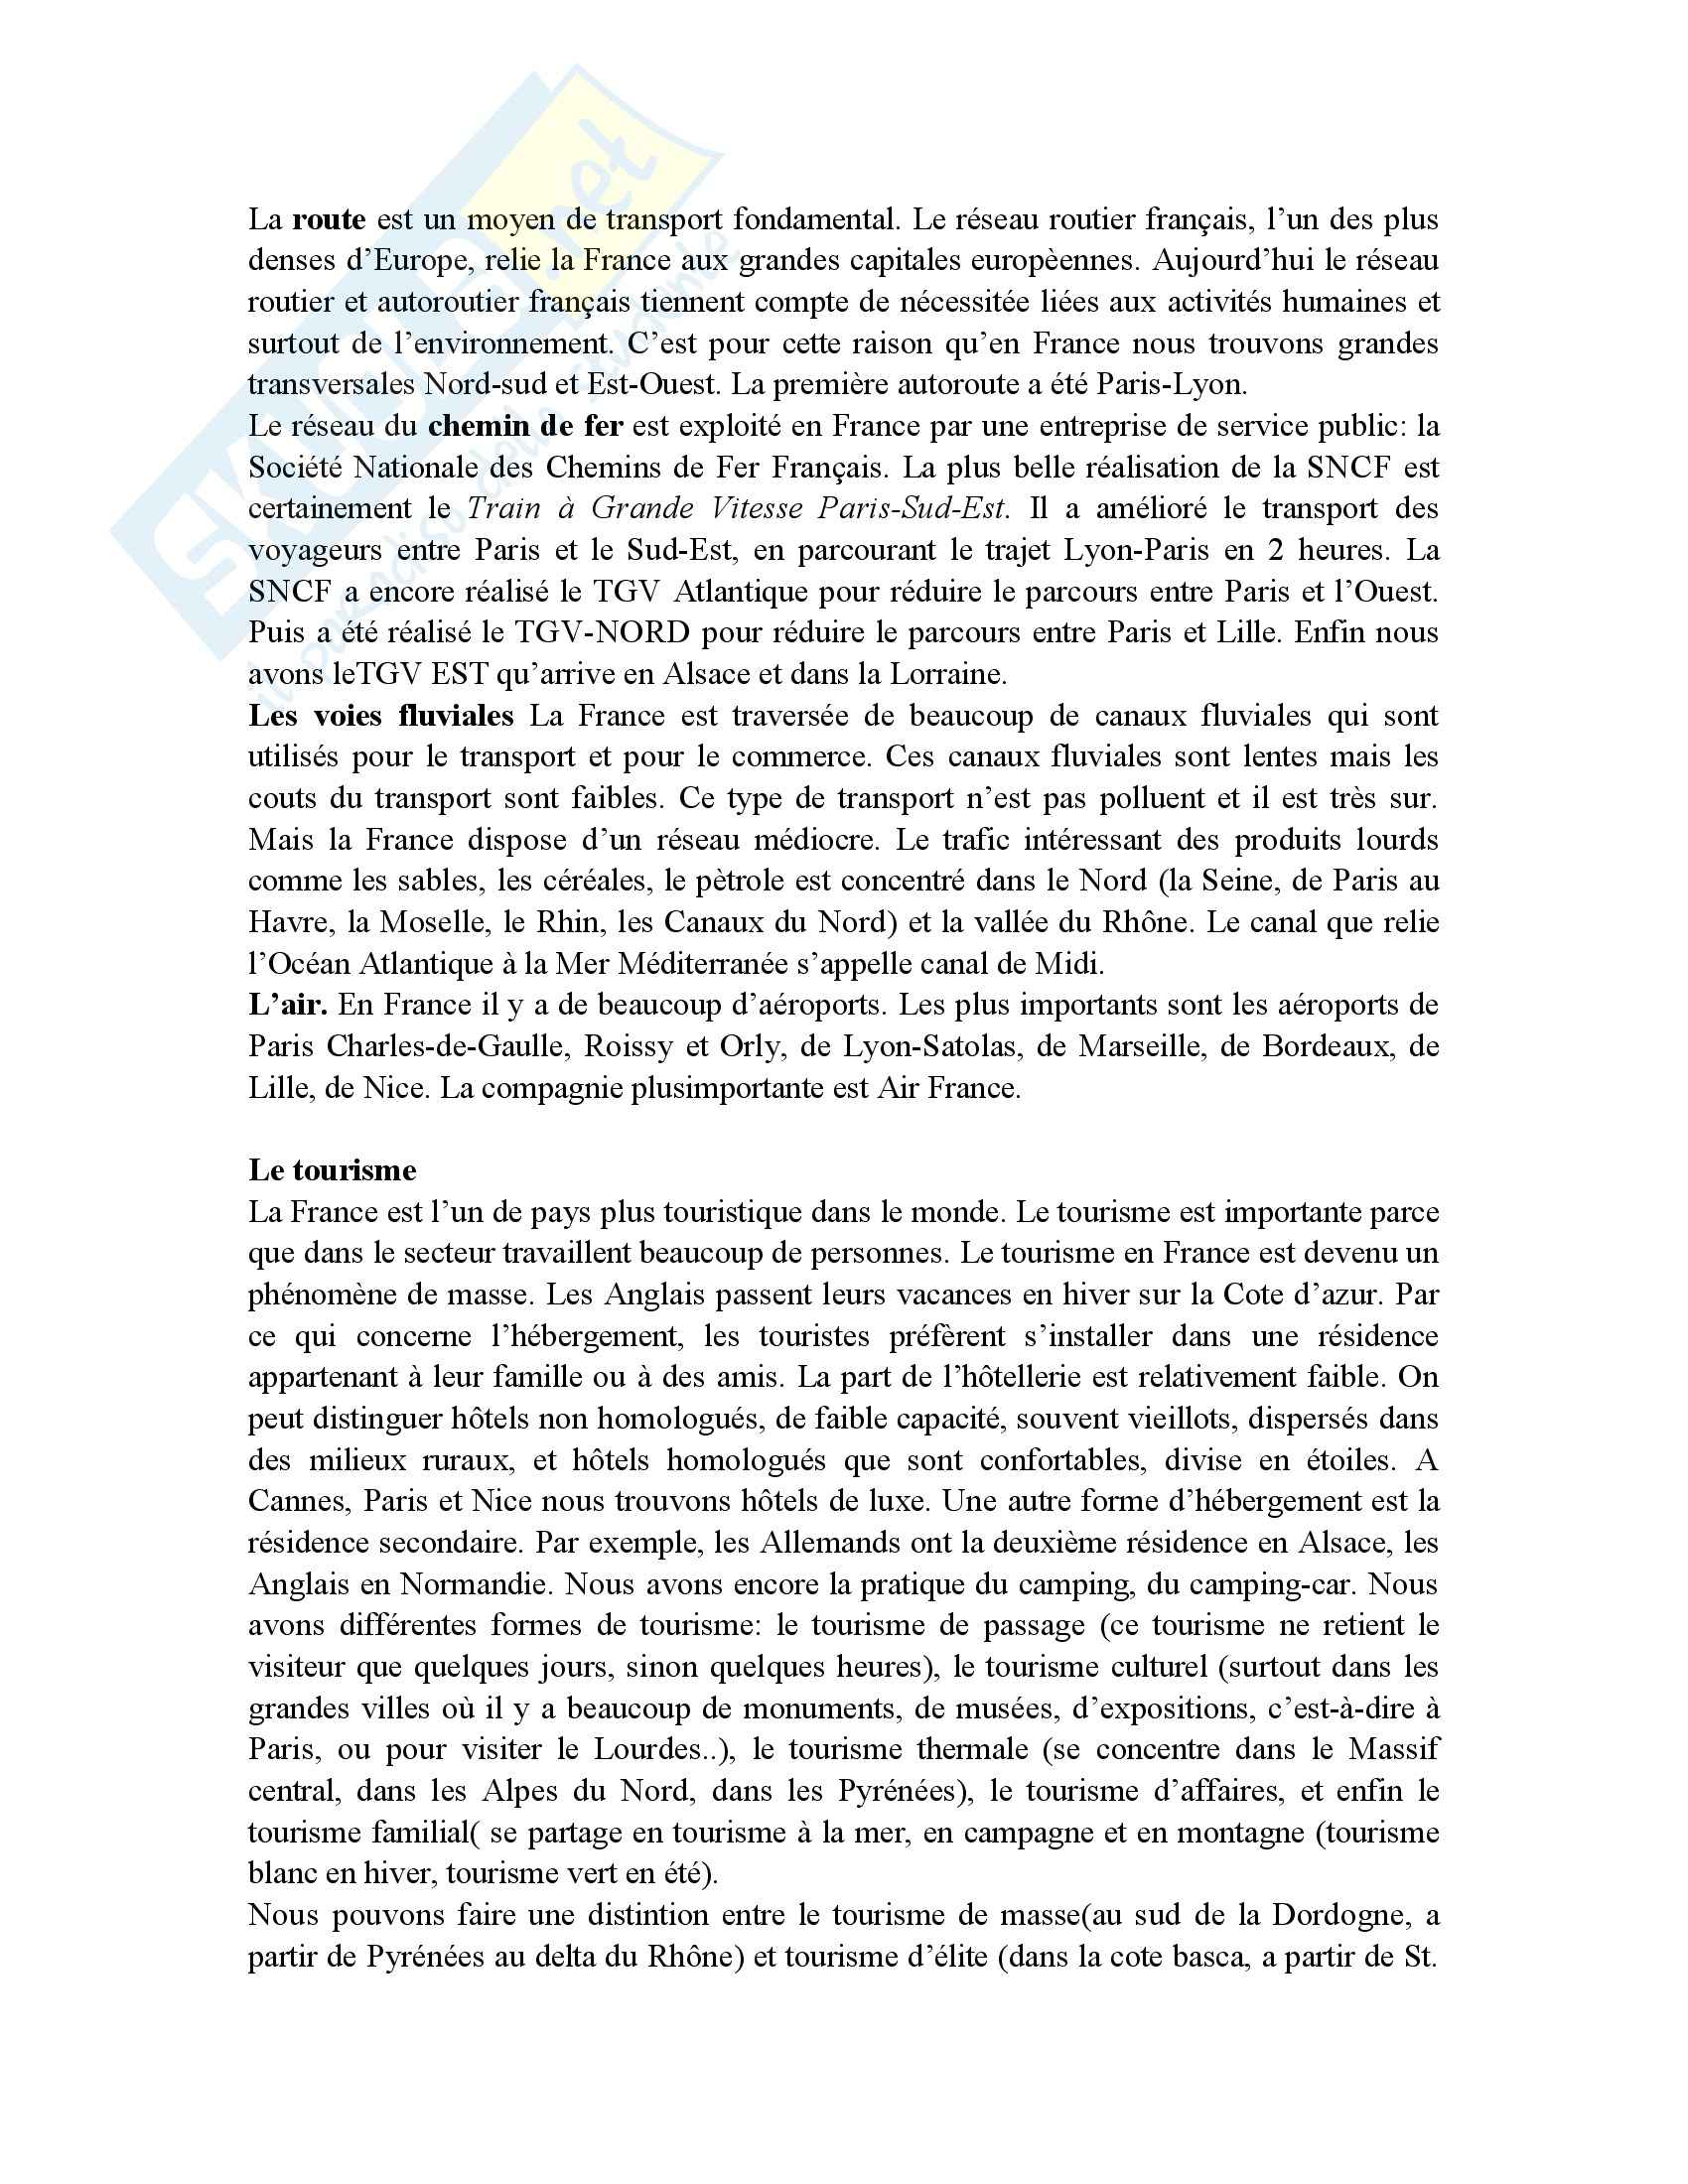 Francese - nozioni generali - Appunti Pag. 6